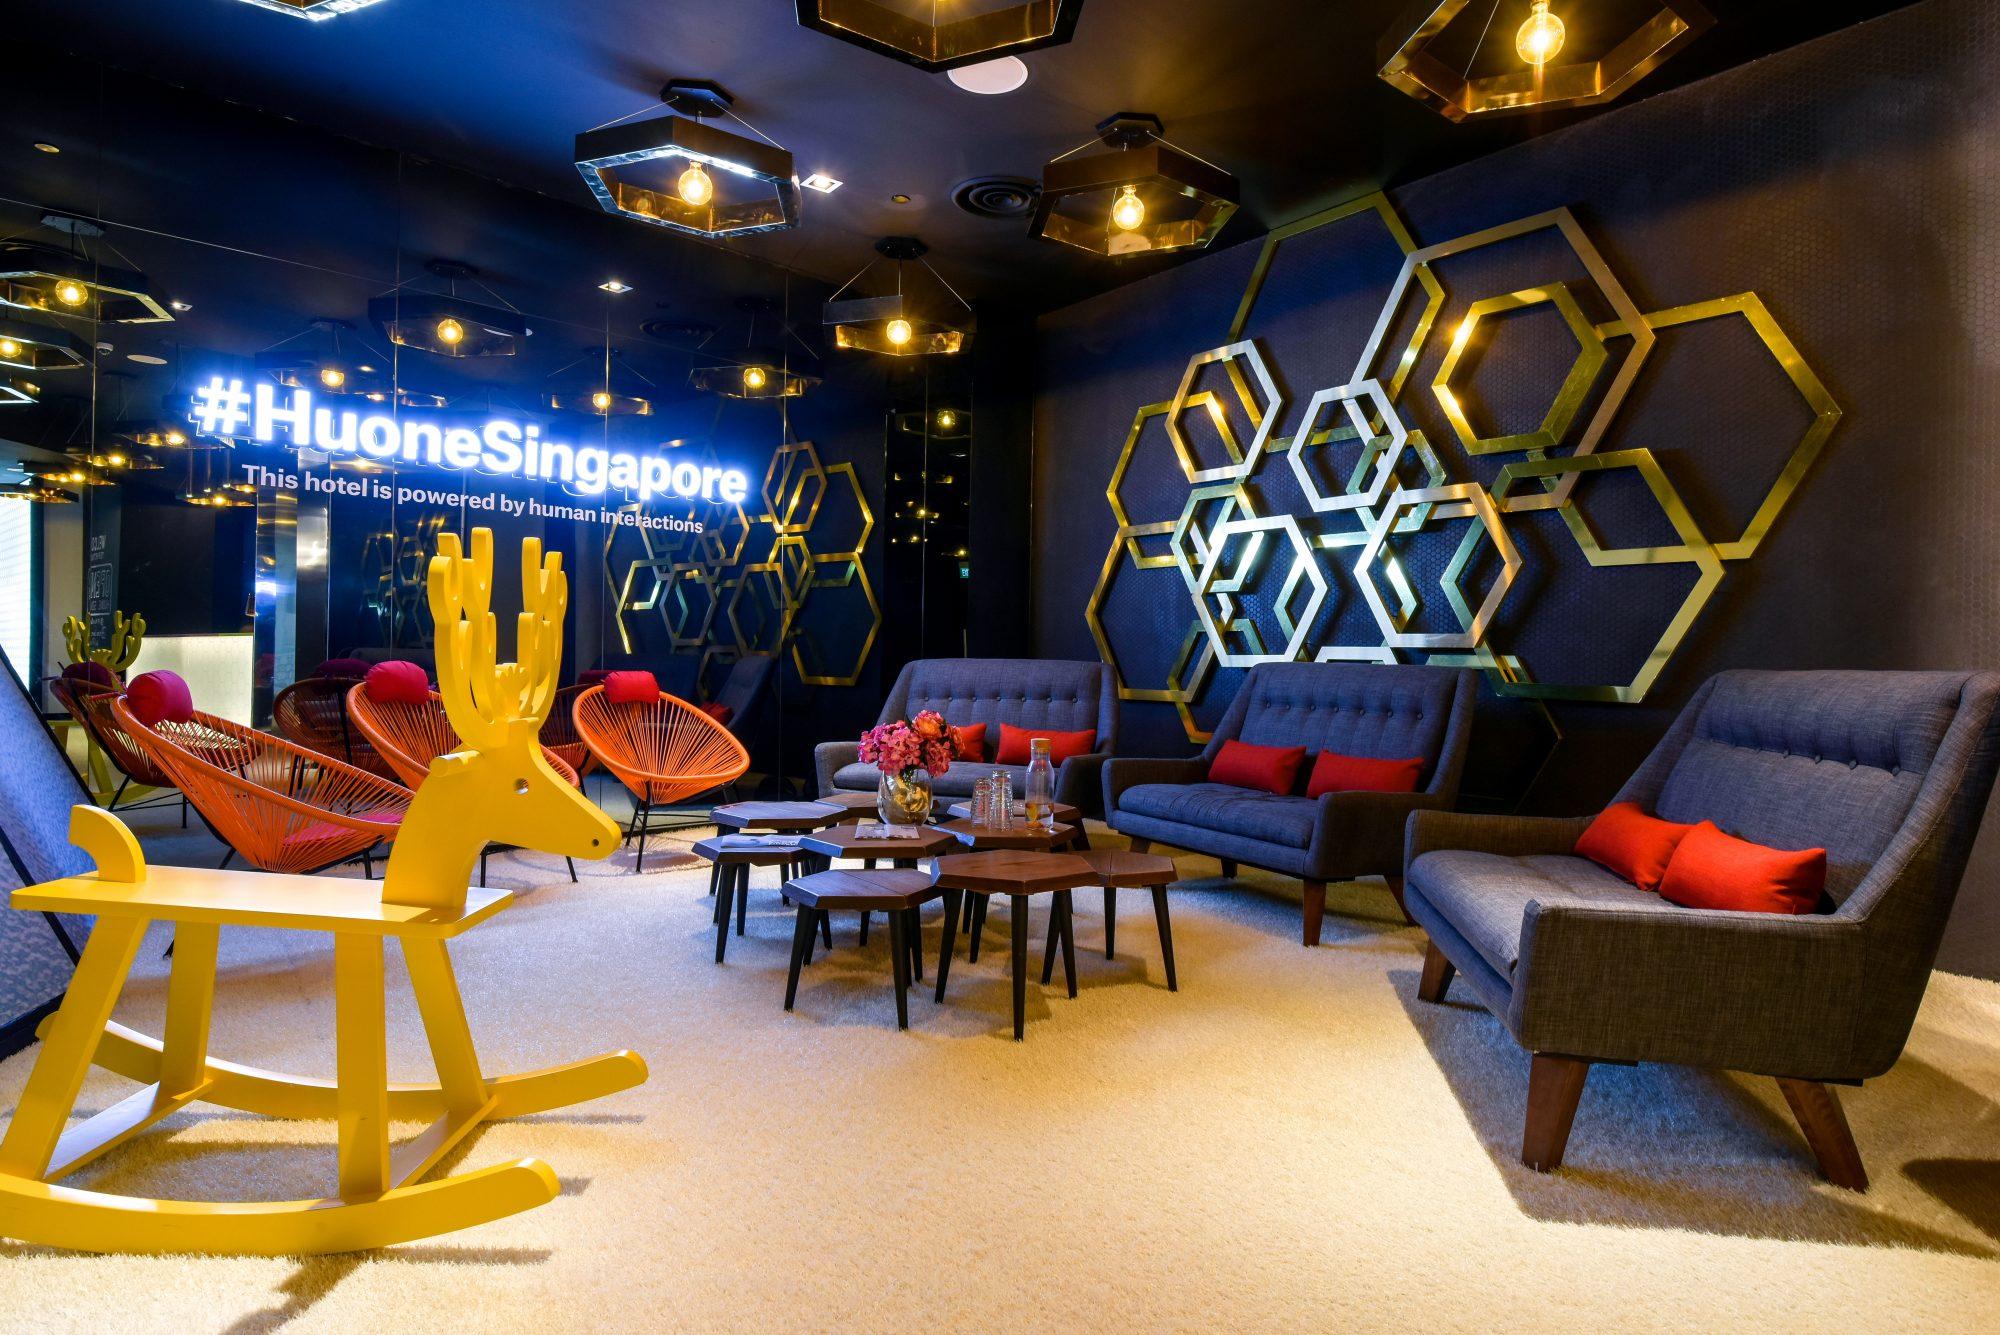 Event Venues Singapore Huone Singapore